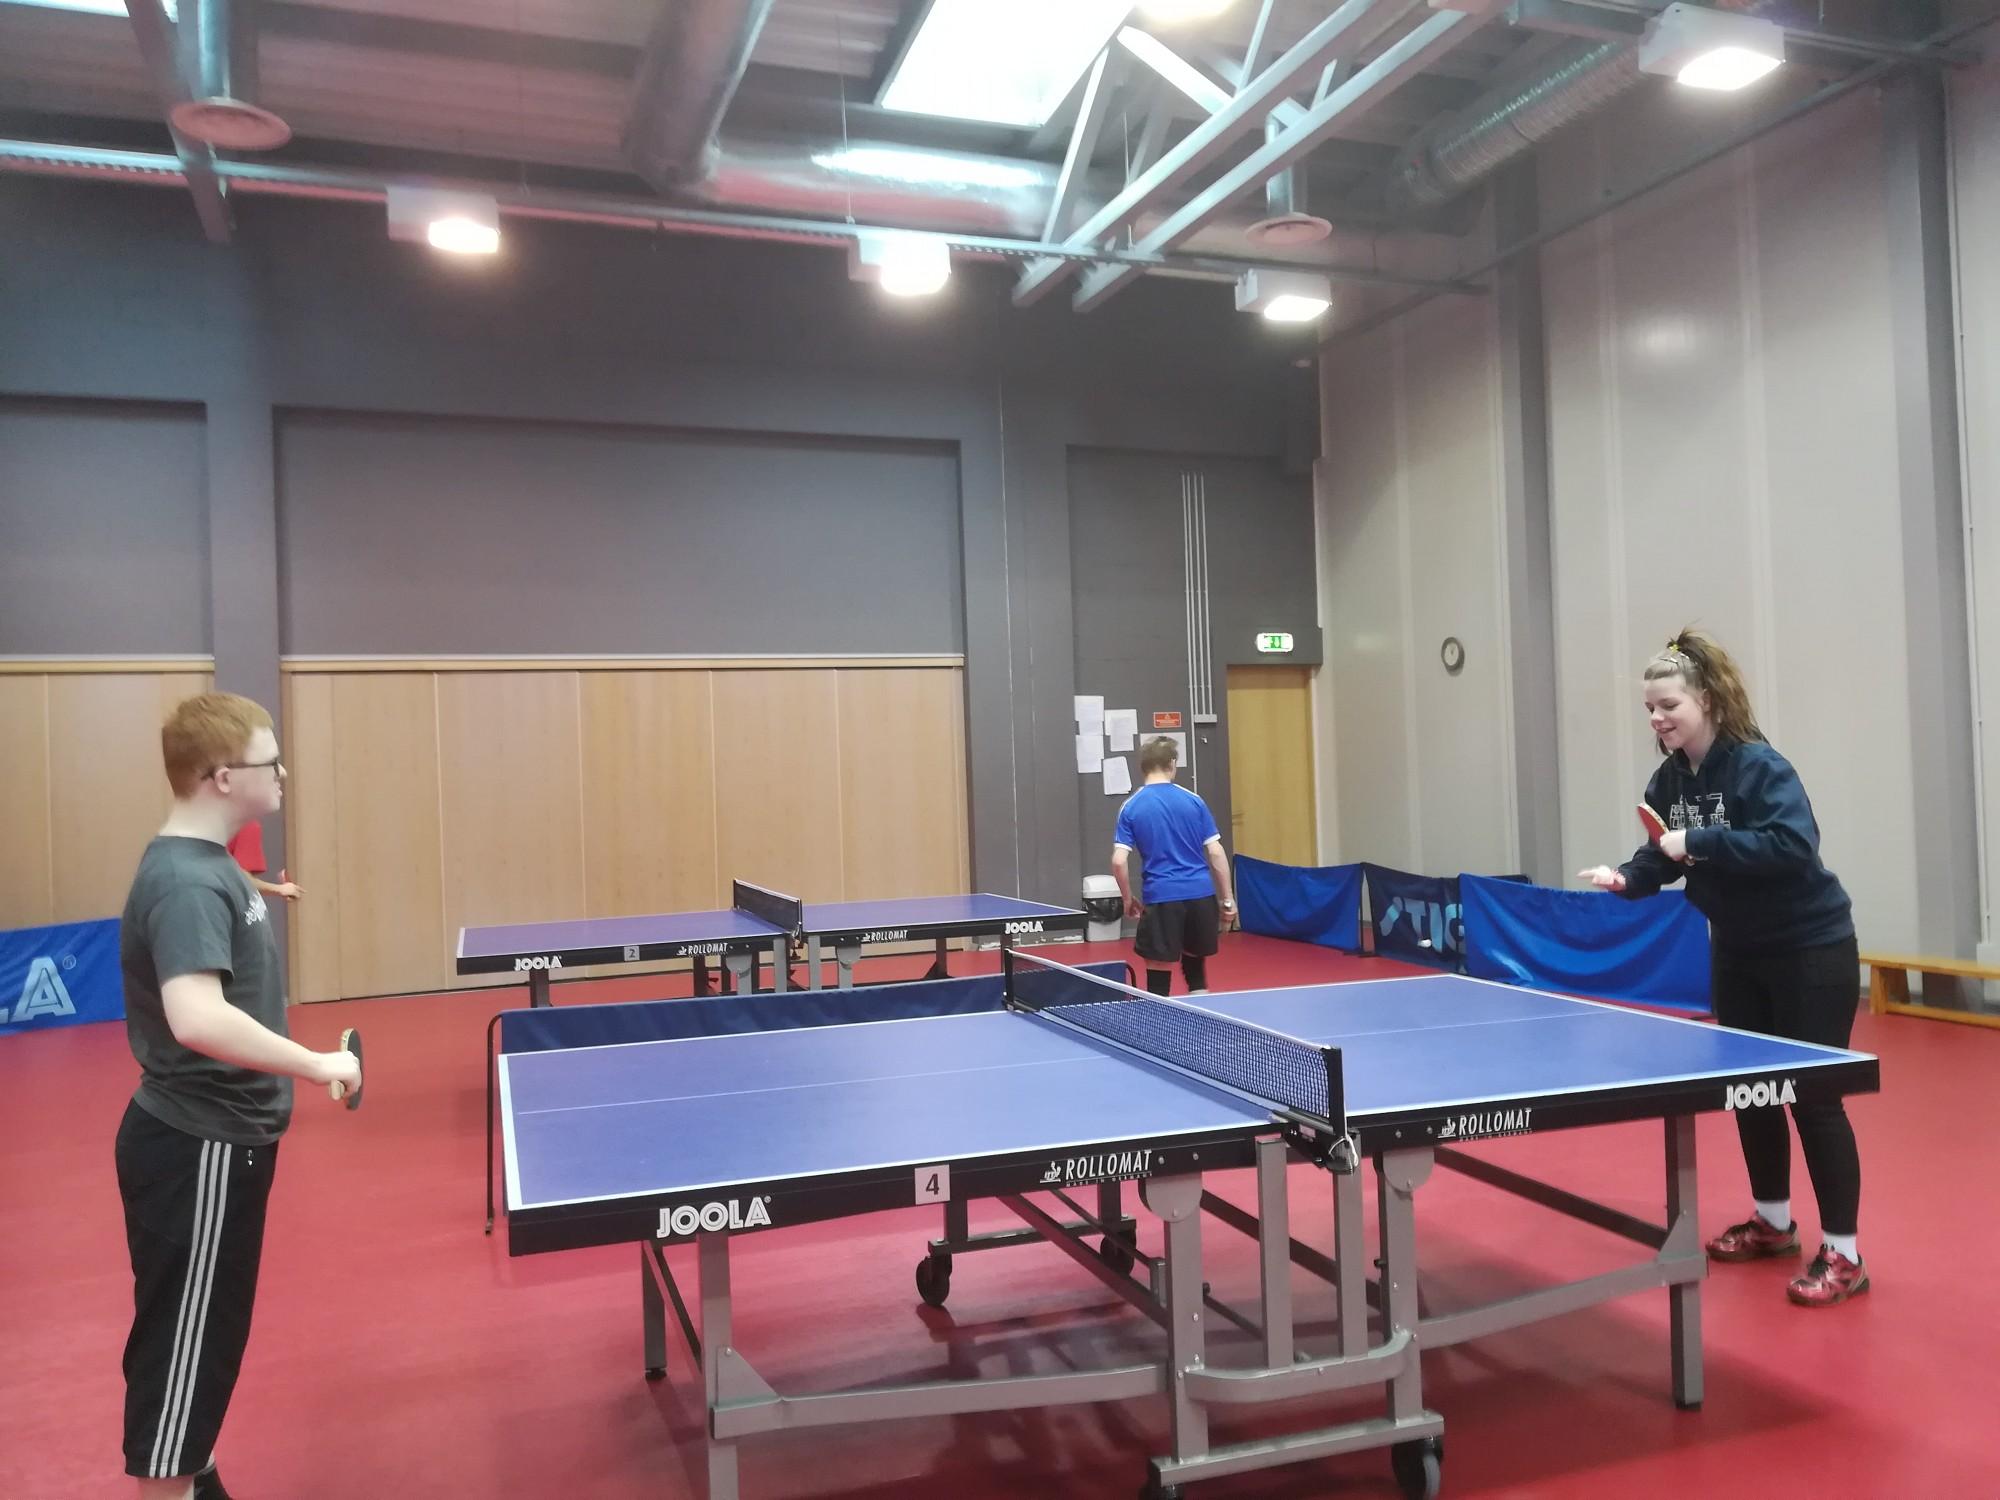 Aizvada pingponga sporta festivālu